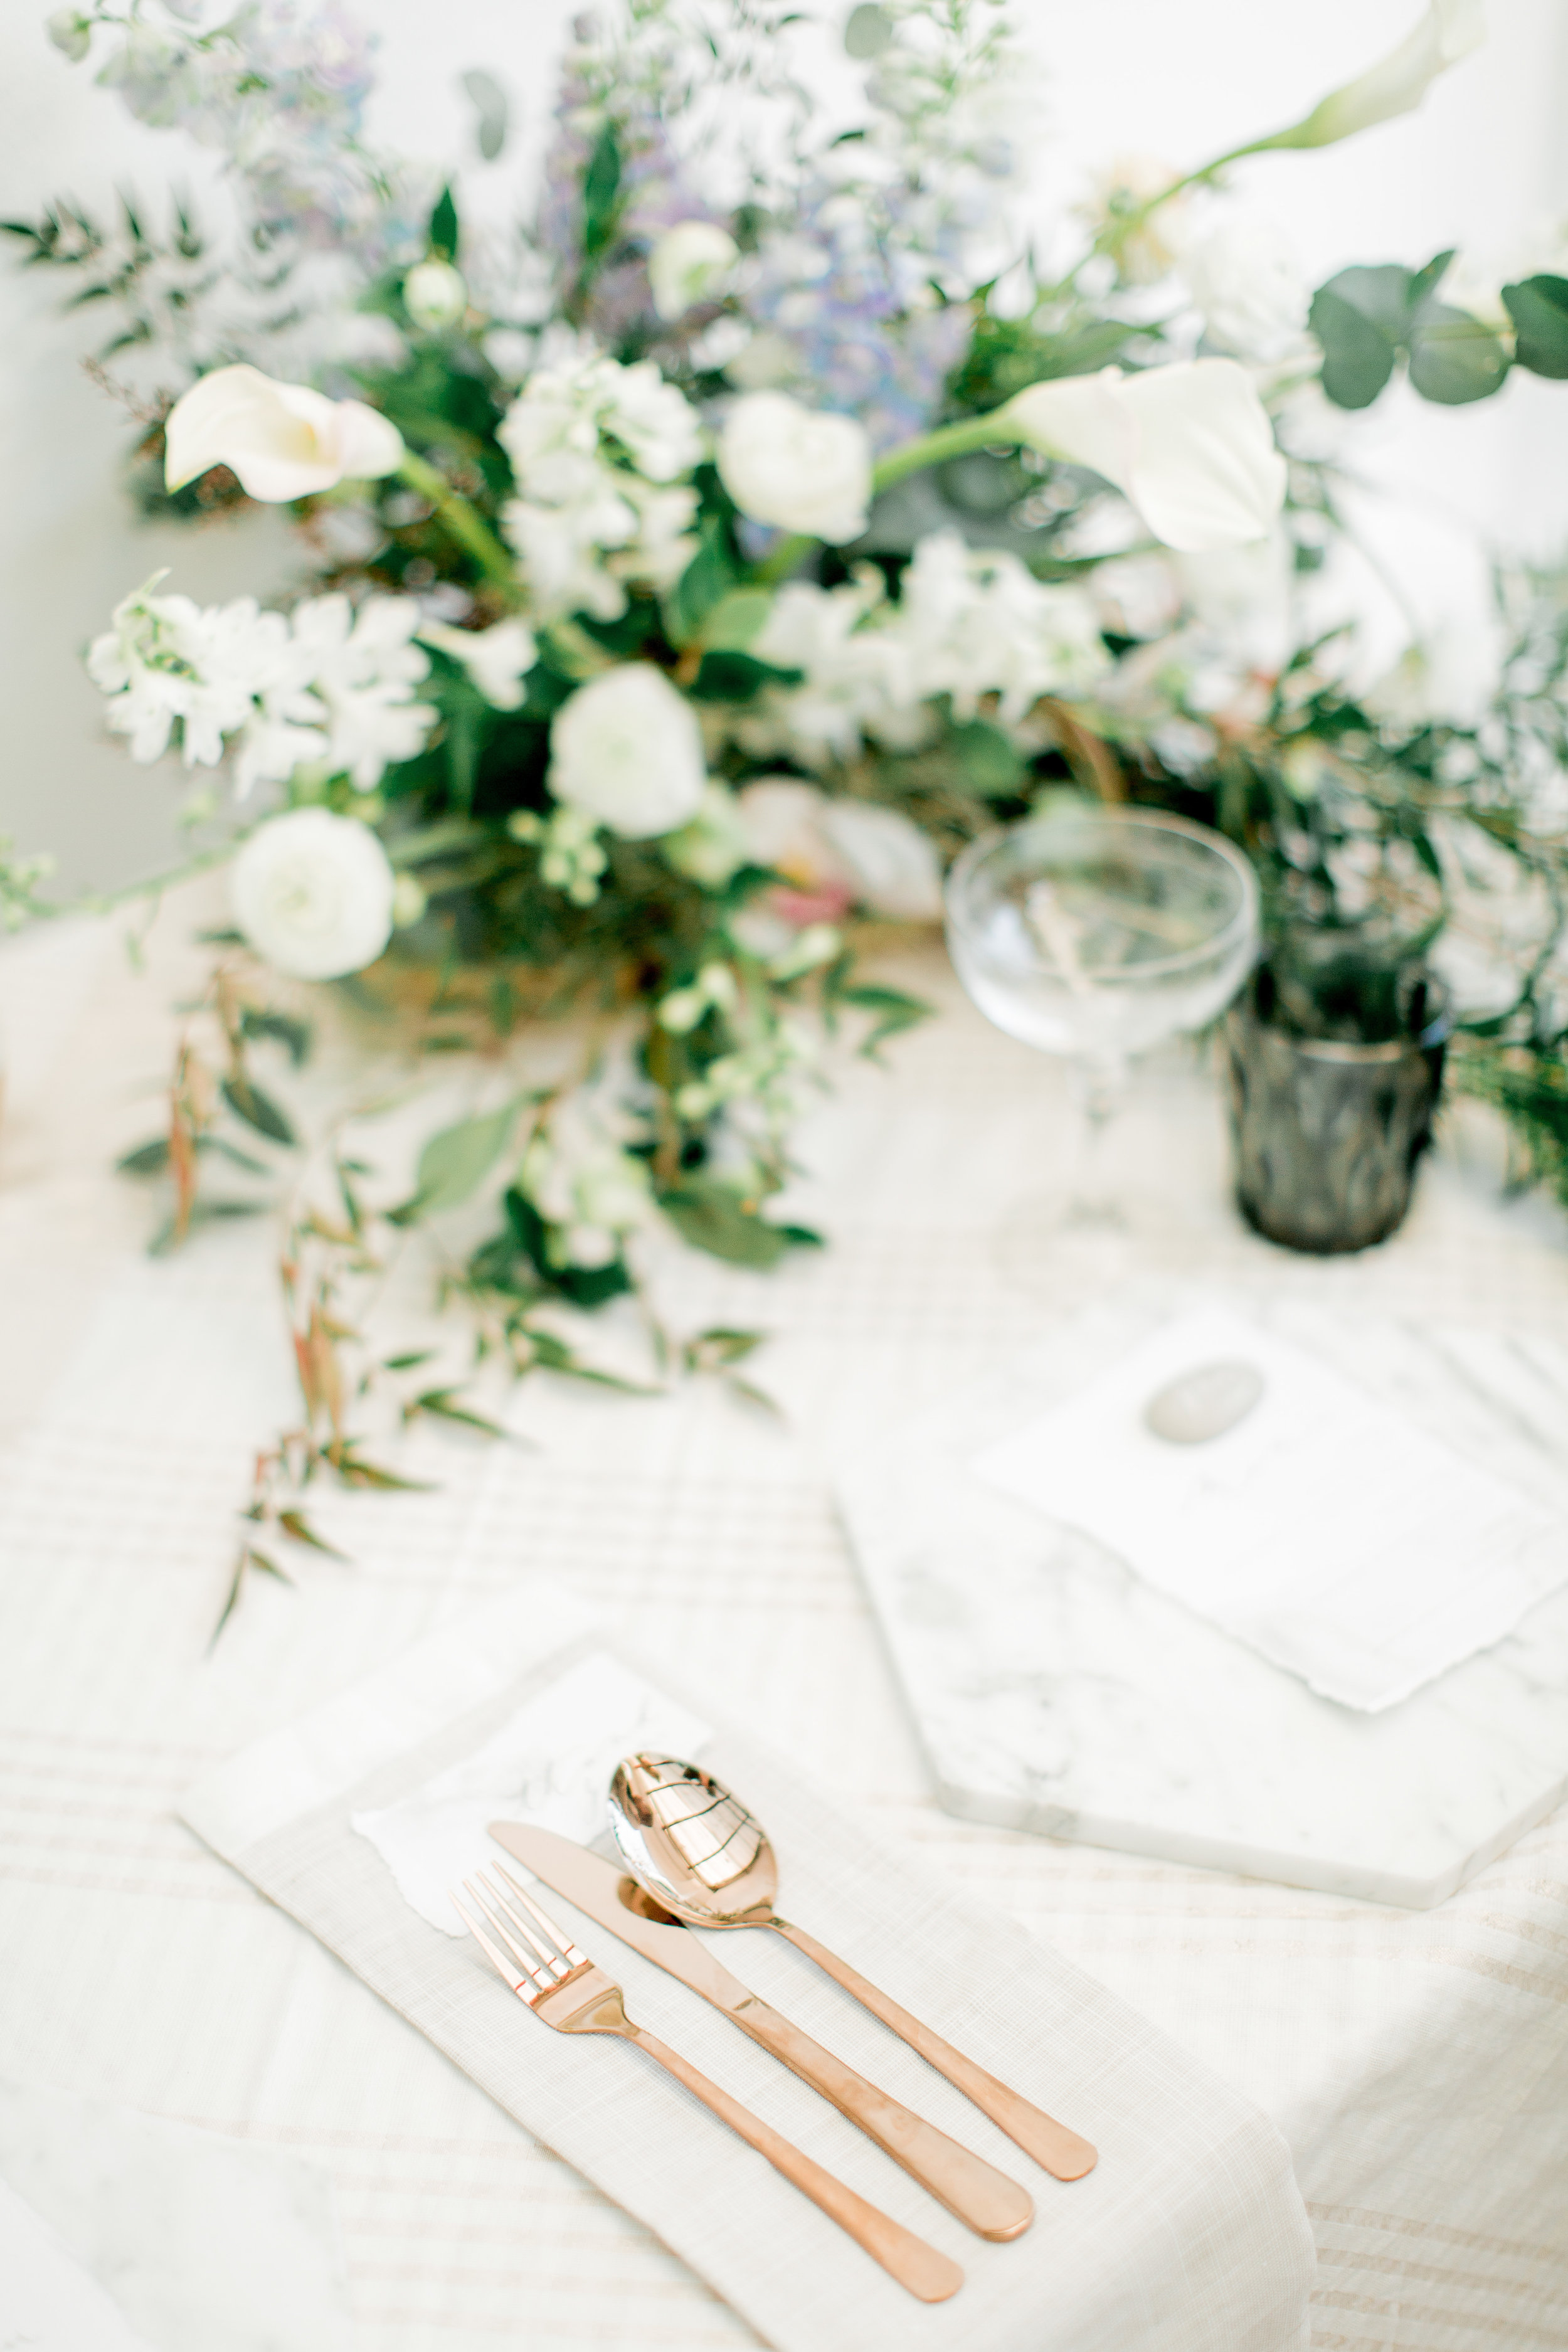 gauteng wedding photographer clareece smit19.jpg